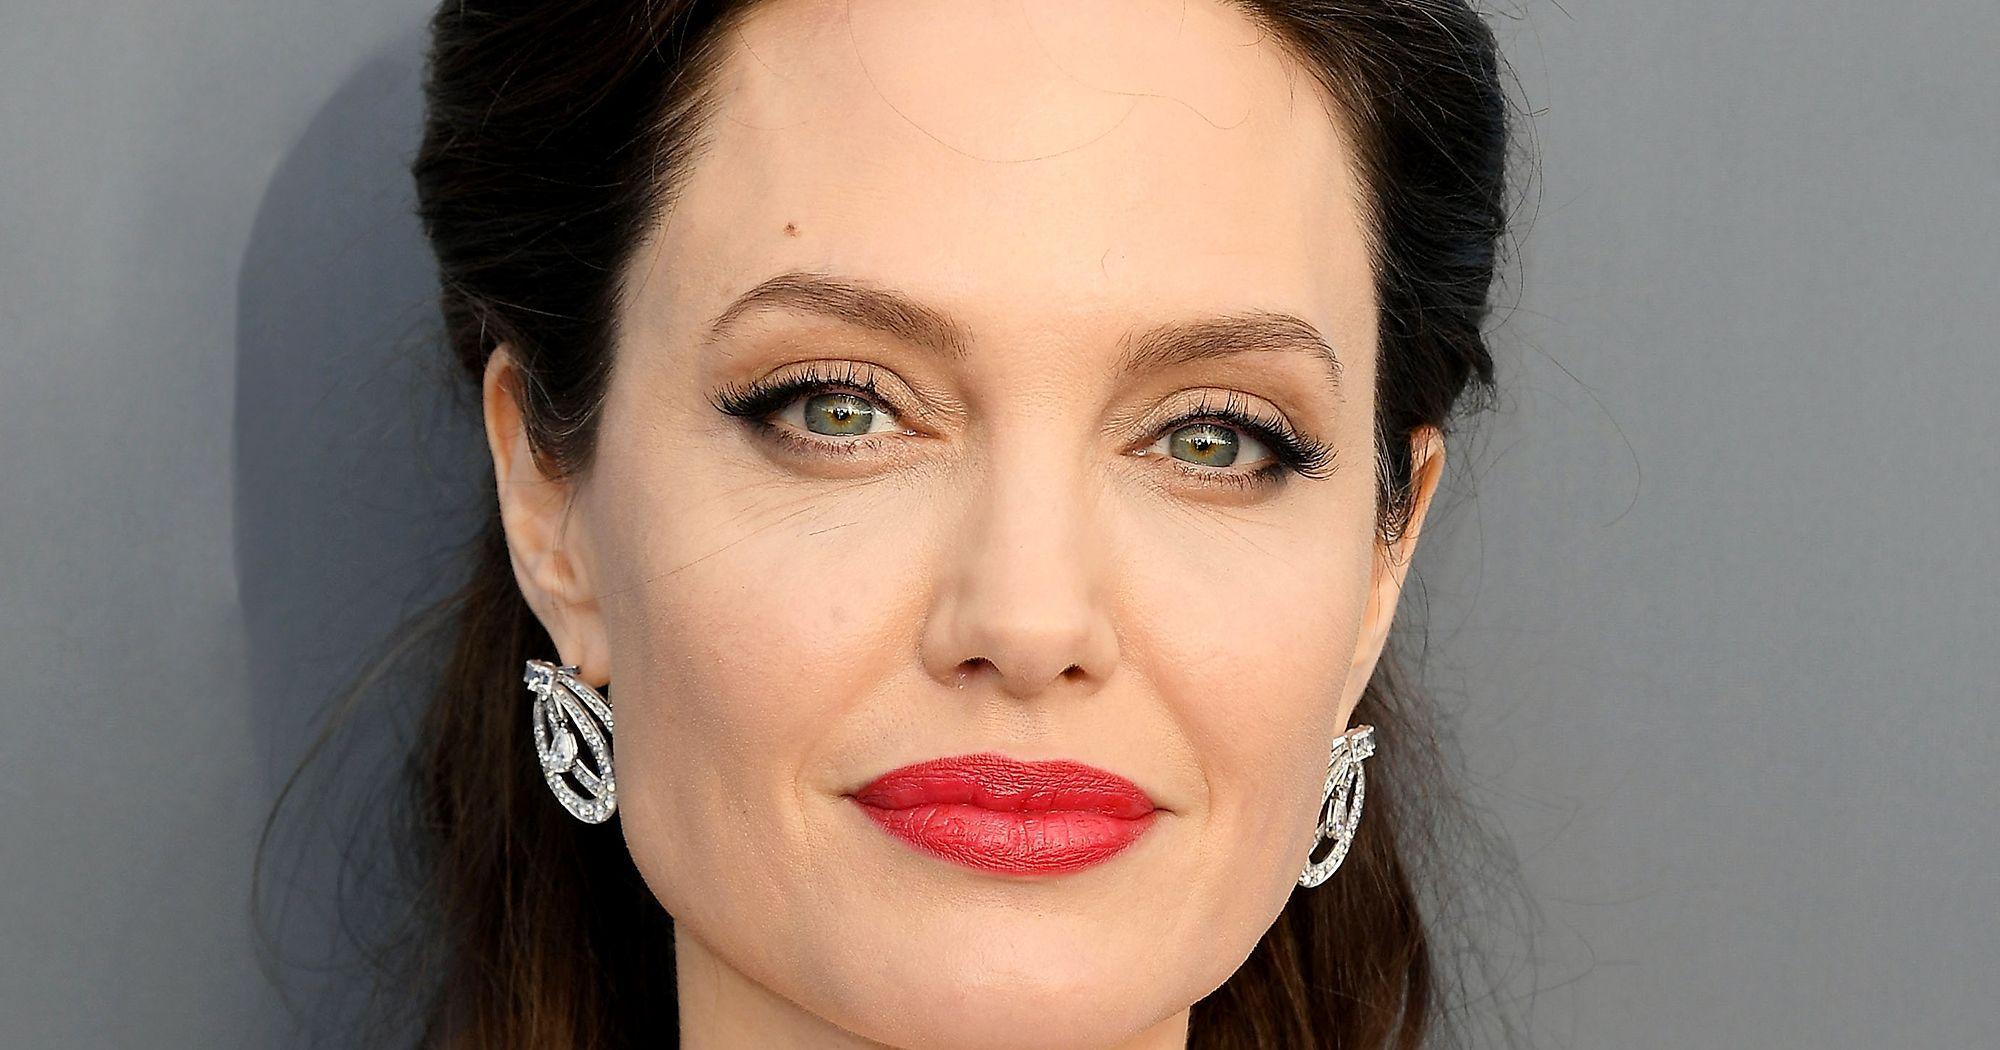 Angelina Jolie S Longtime Dermatologist Shares Her Skin Secrets Skin Care Regimen Skin Care Moisturizer Angelina